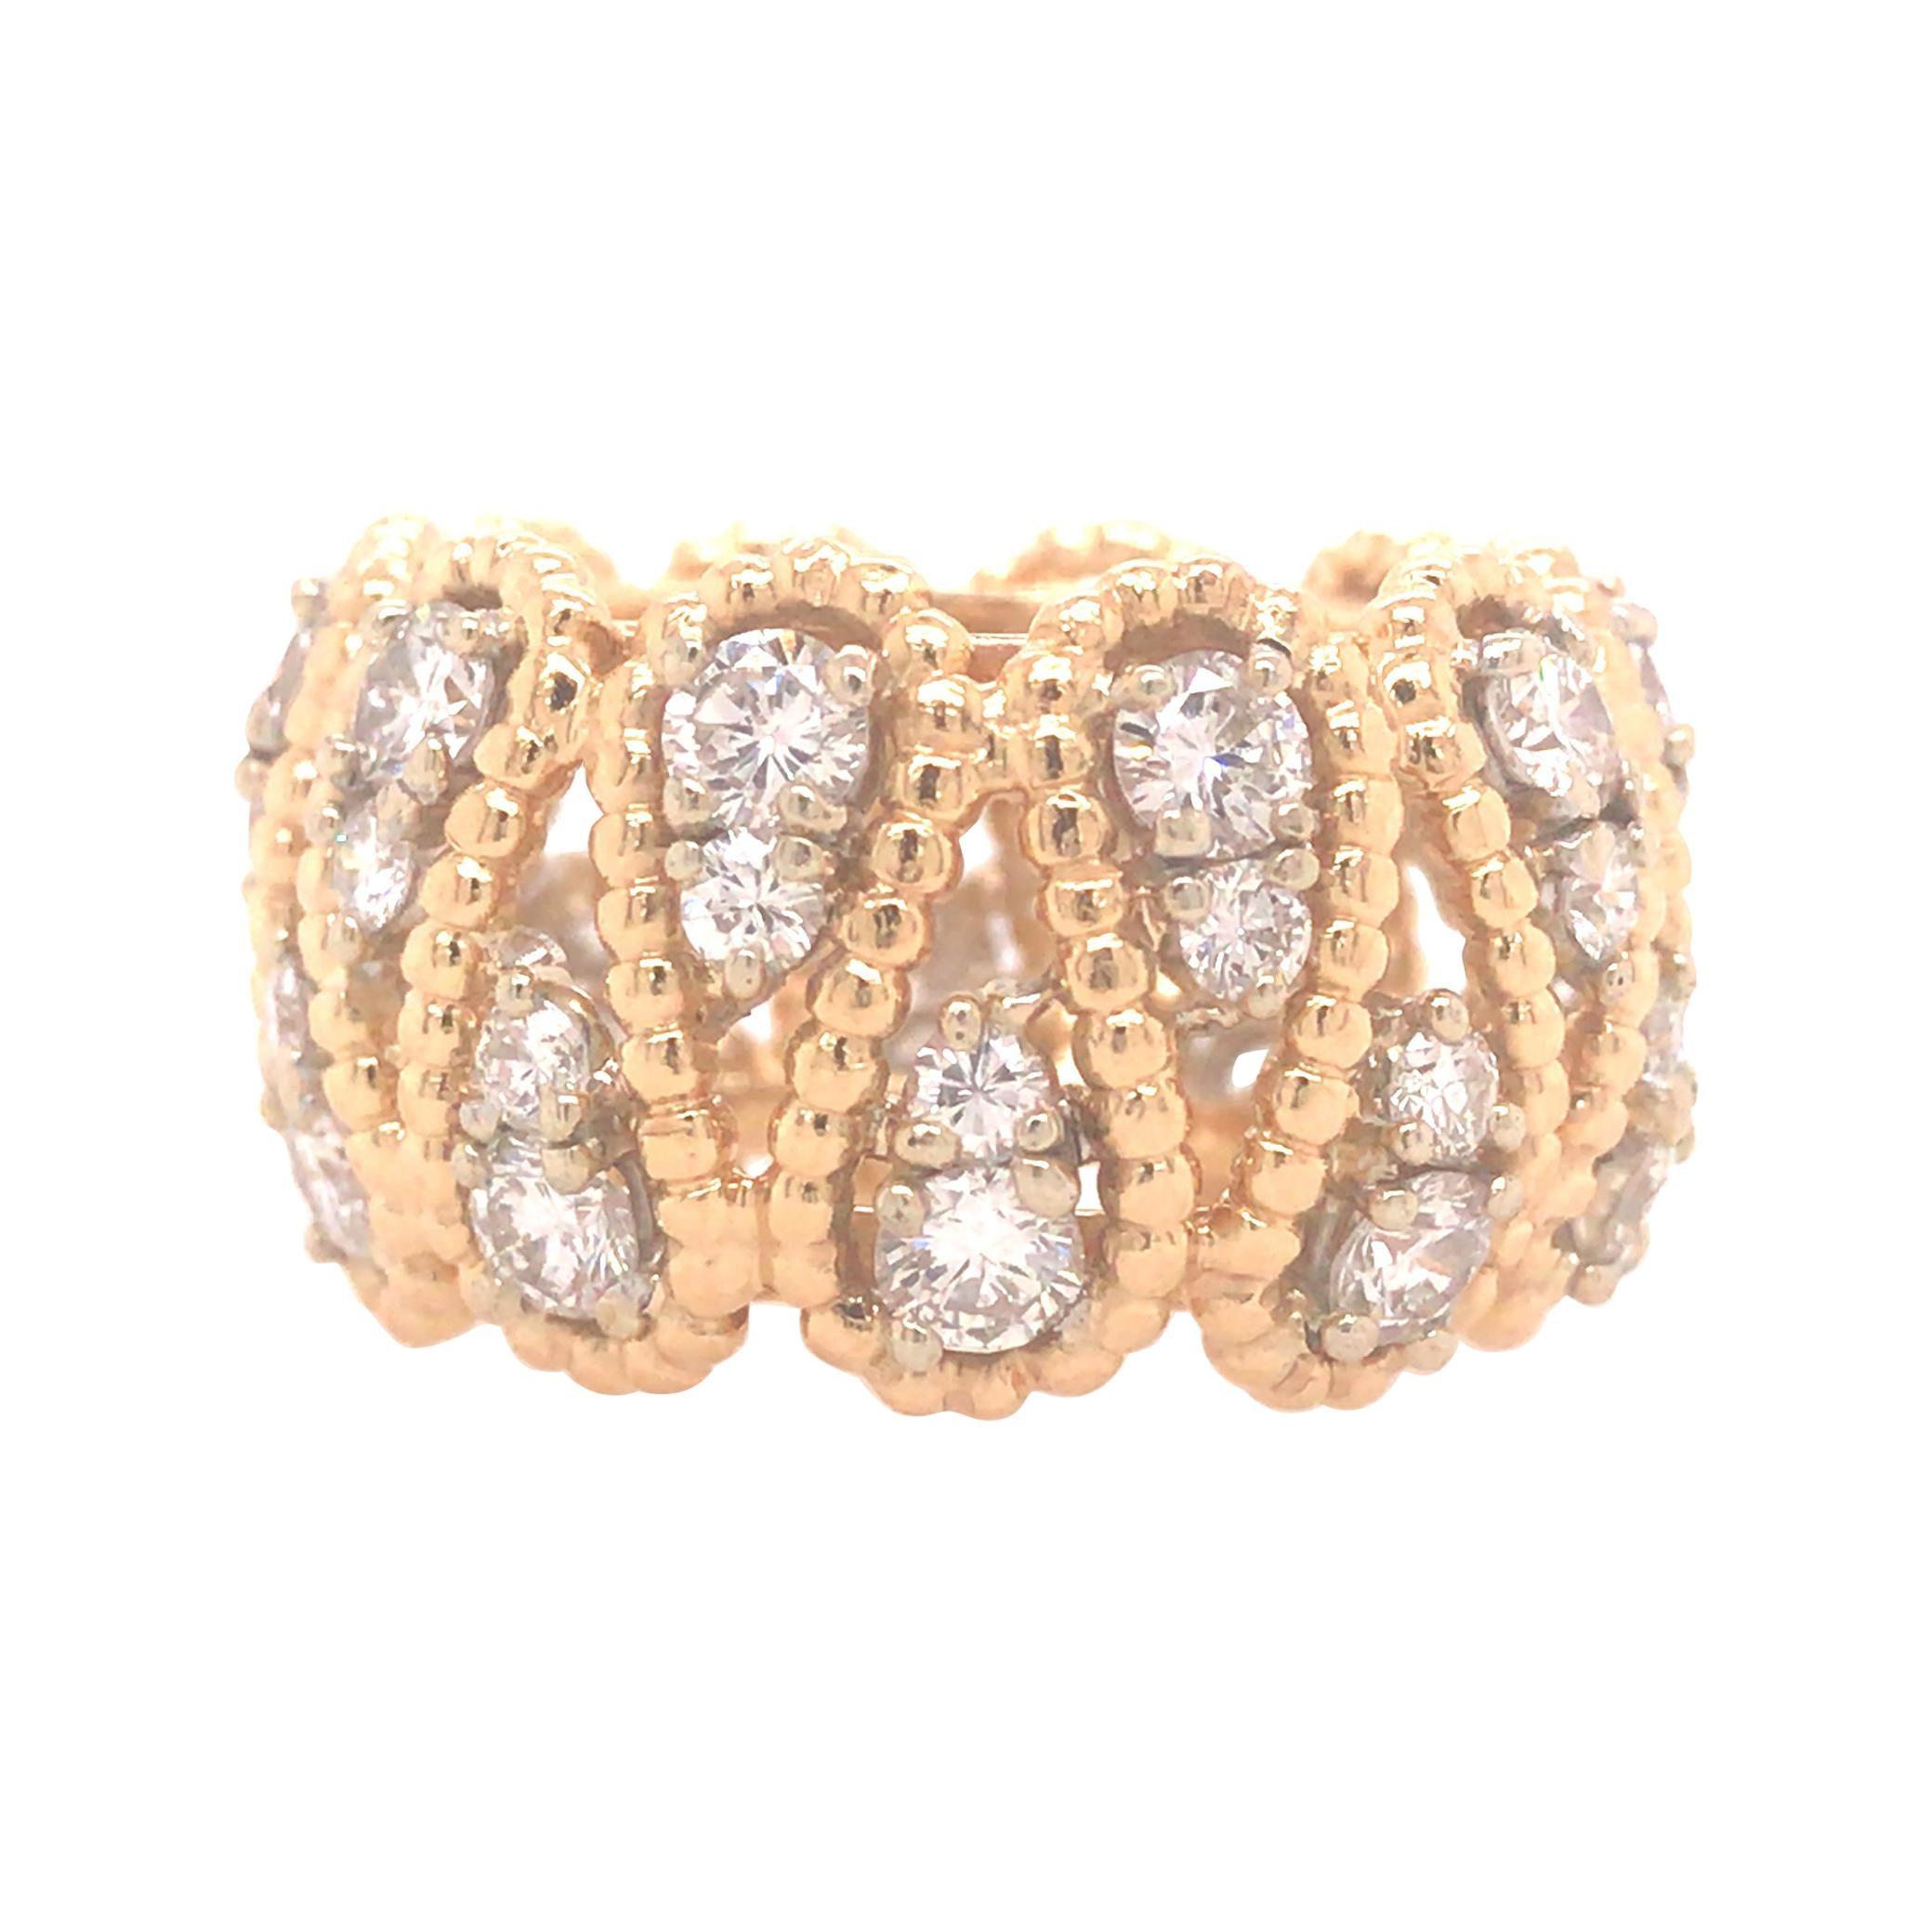 18K Tiffany & Co. Vintage Diamond Eternity Band Two-Tone Gold